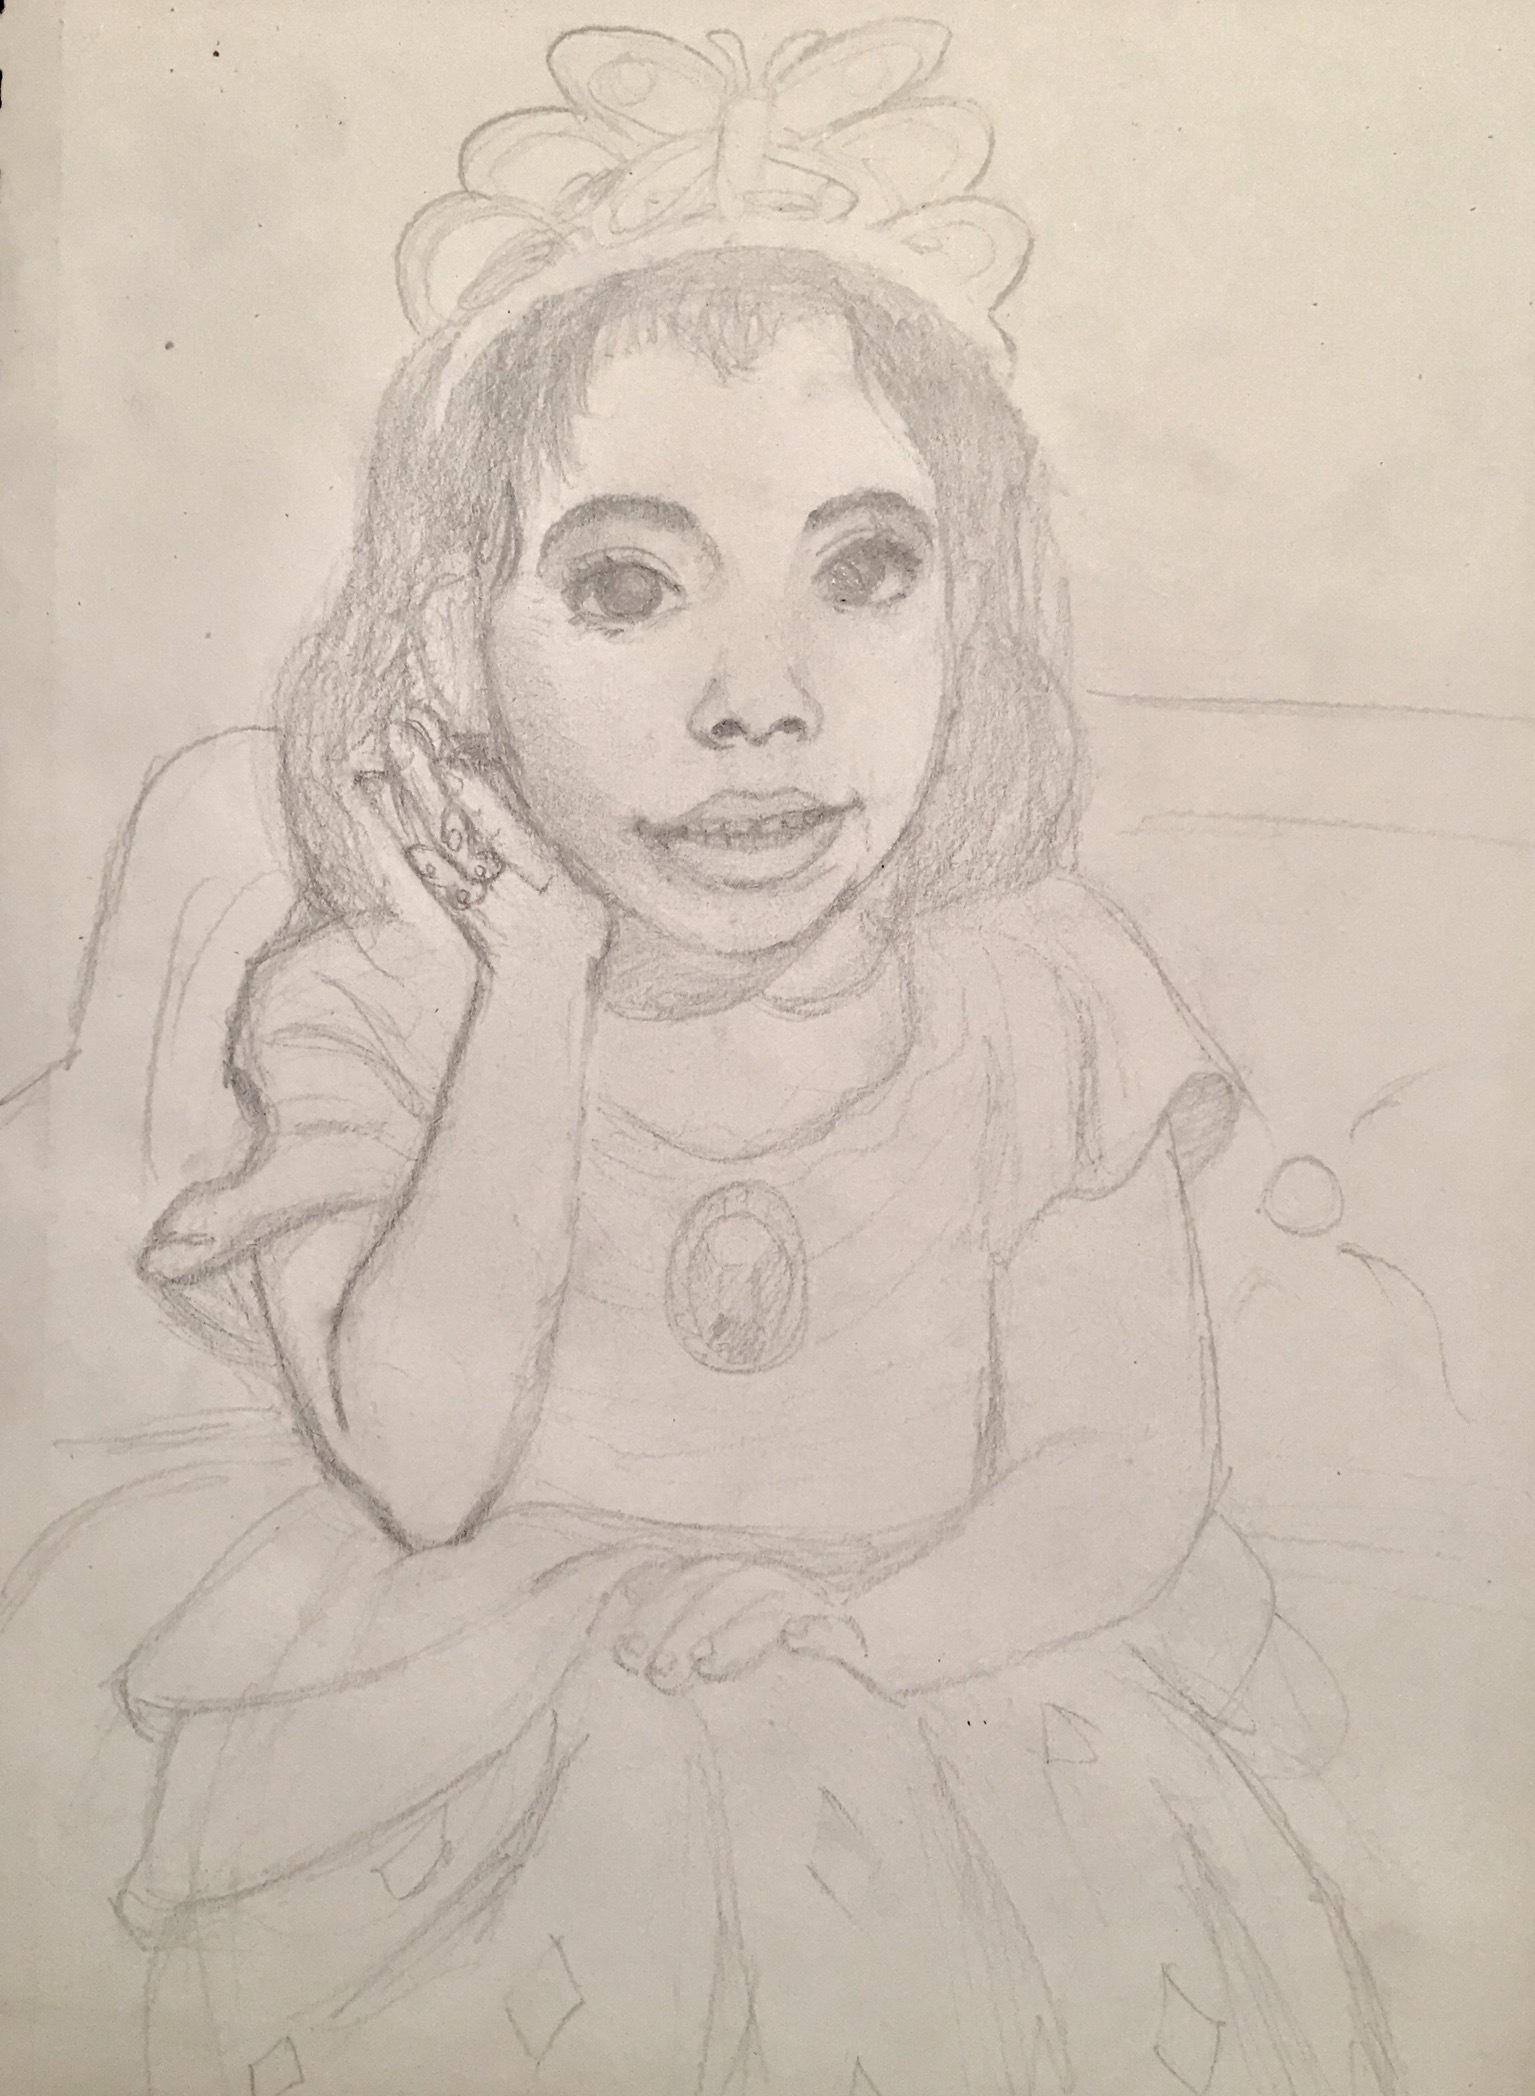 WIP Portrait of my sister in princess costume